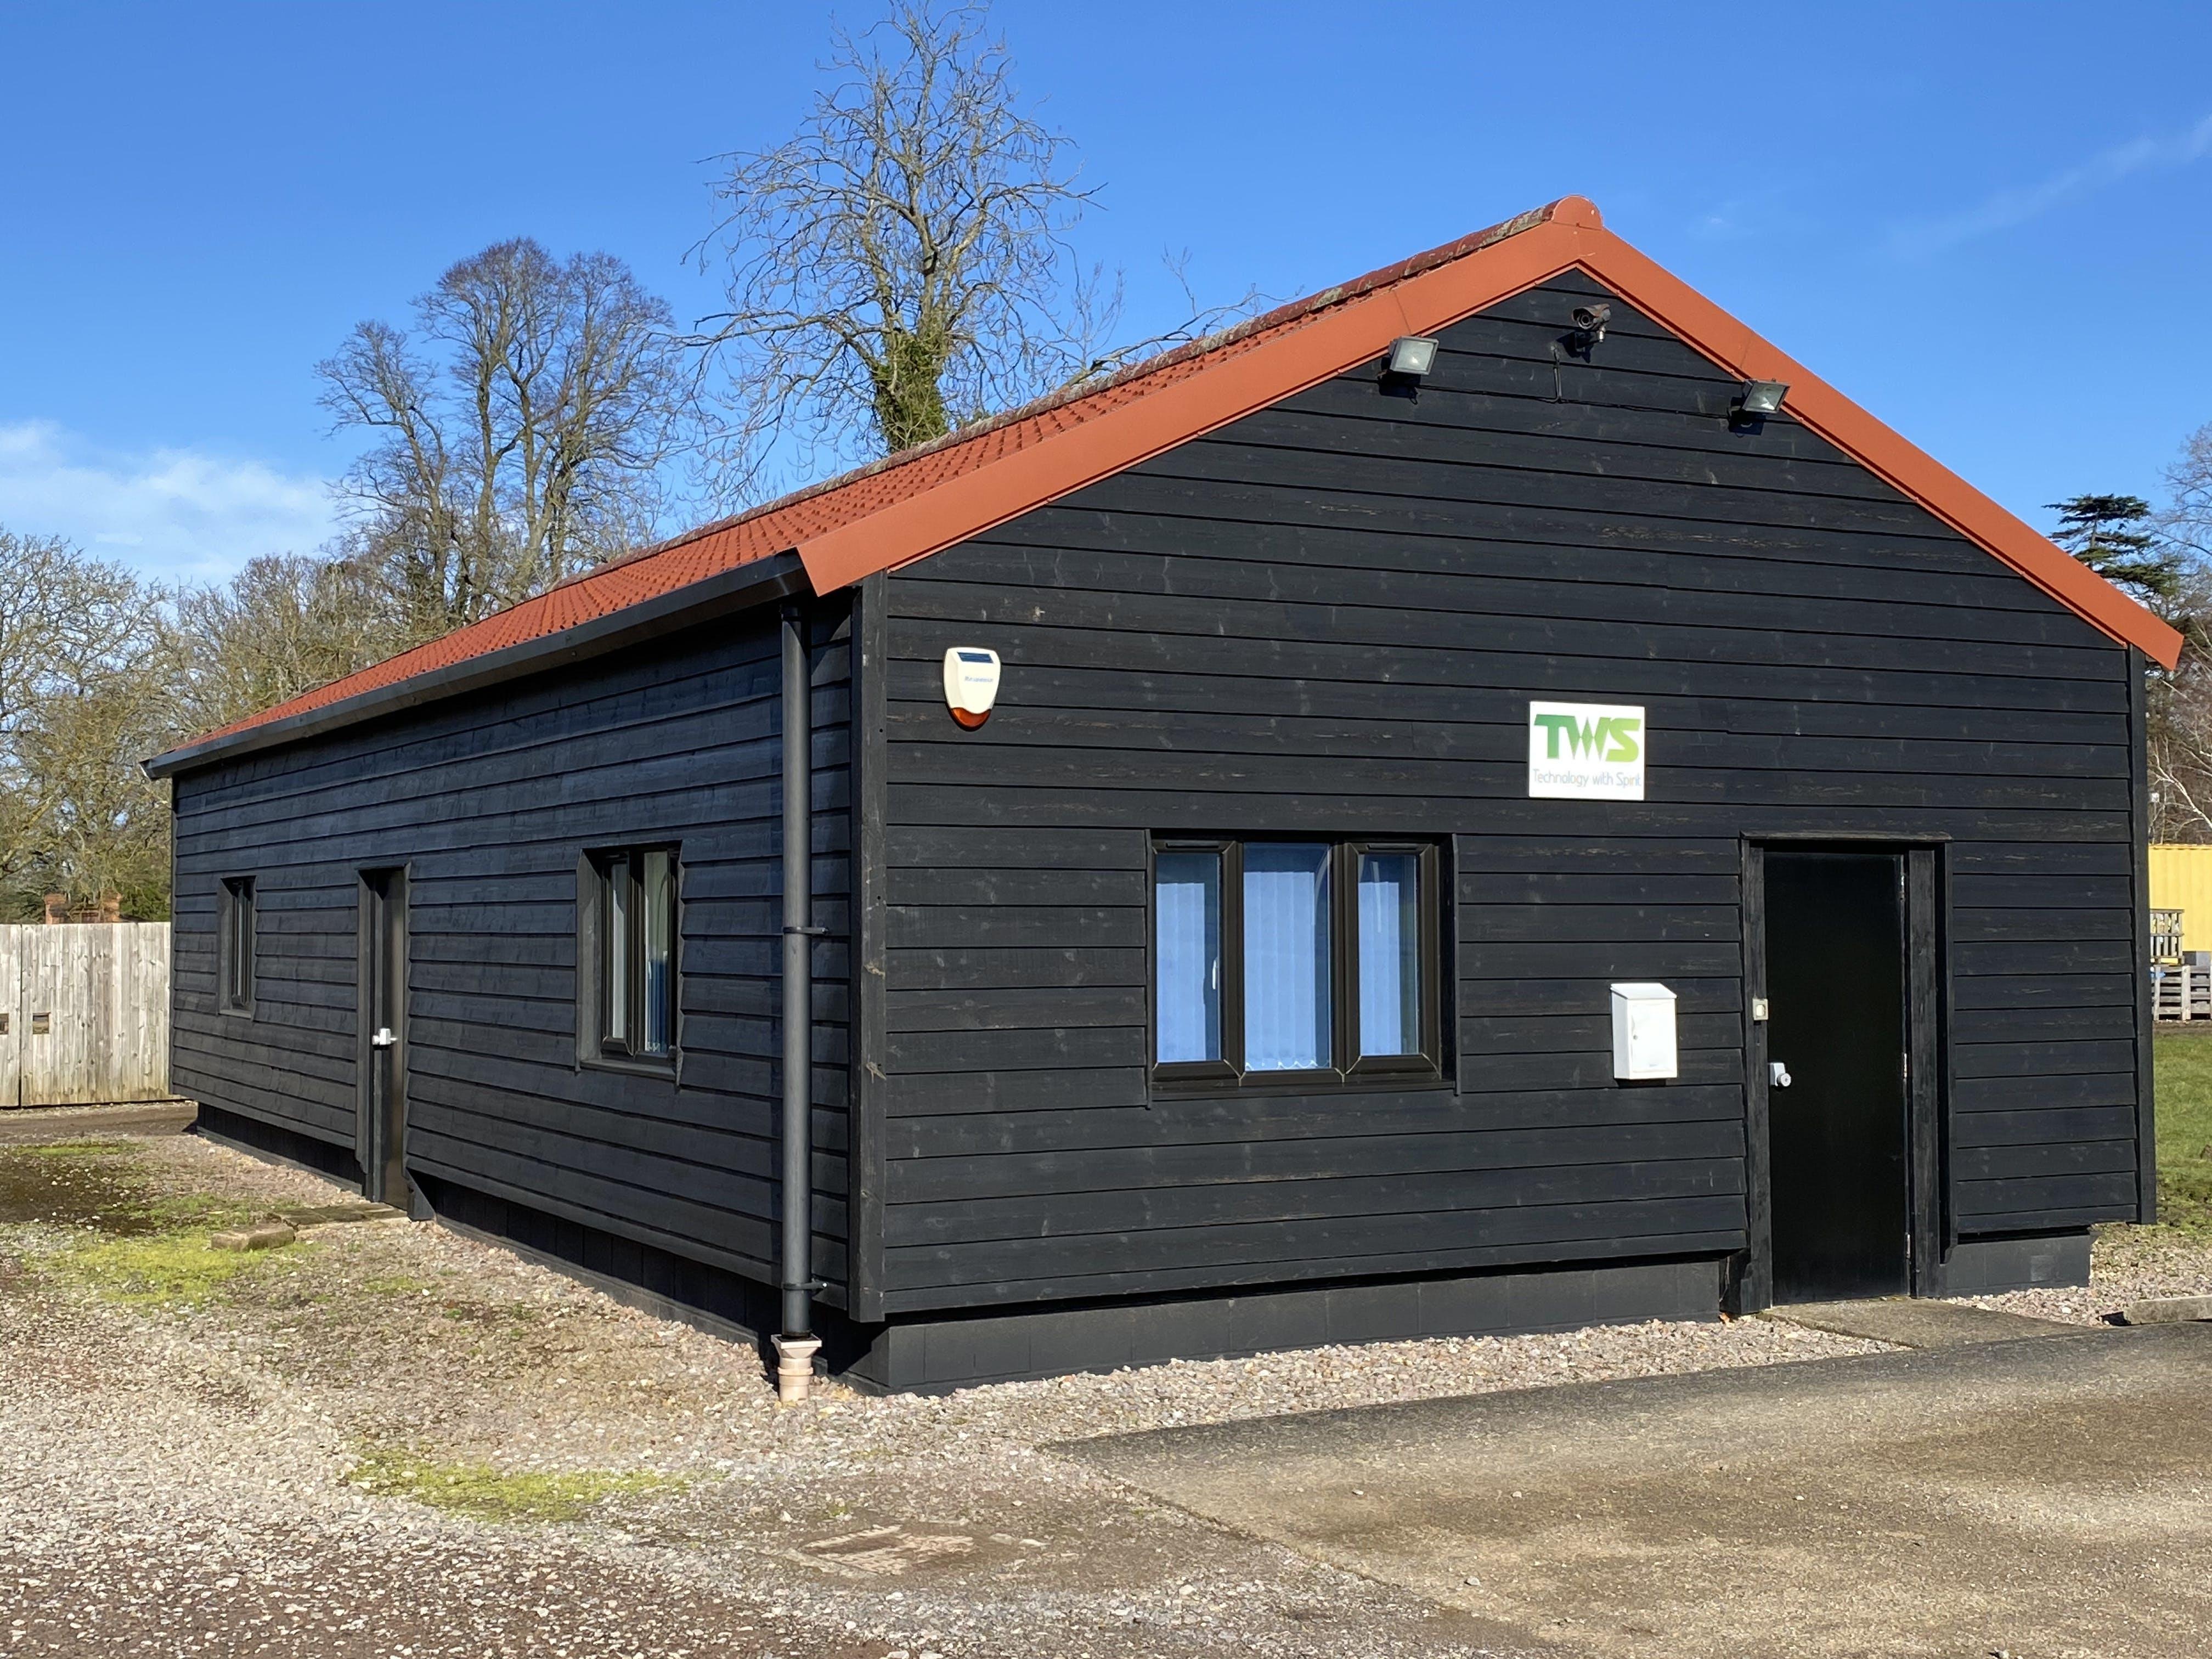 Unit 6, Wyvols Court Farm, Reading, Offices To Let - c35082885d4204484c009965570e30ff6 Wyvols Exterior new 1.jpg